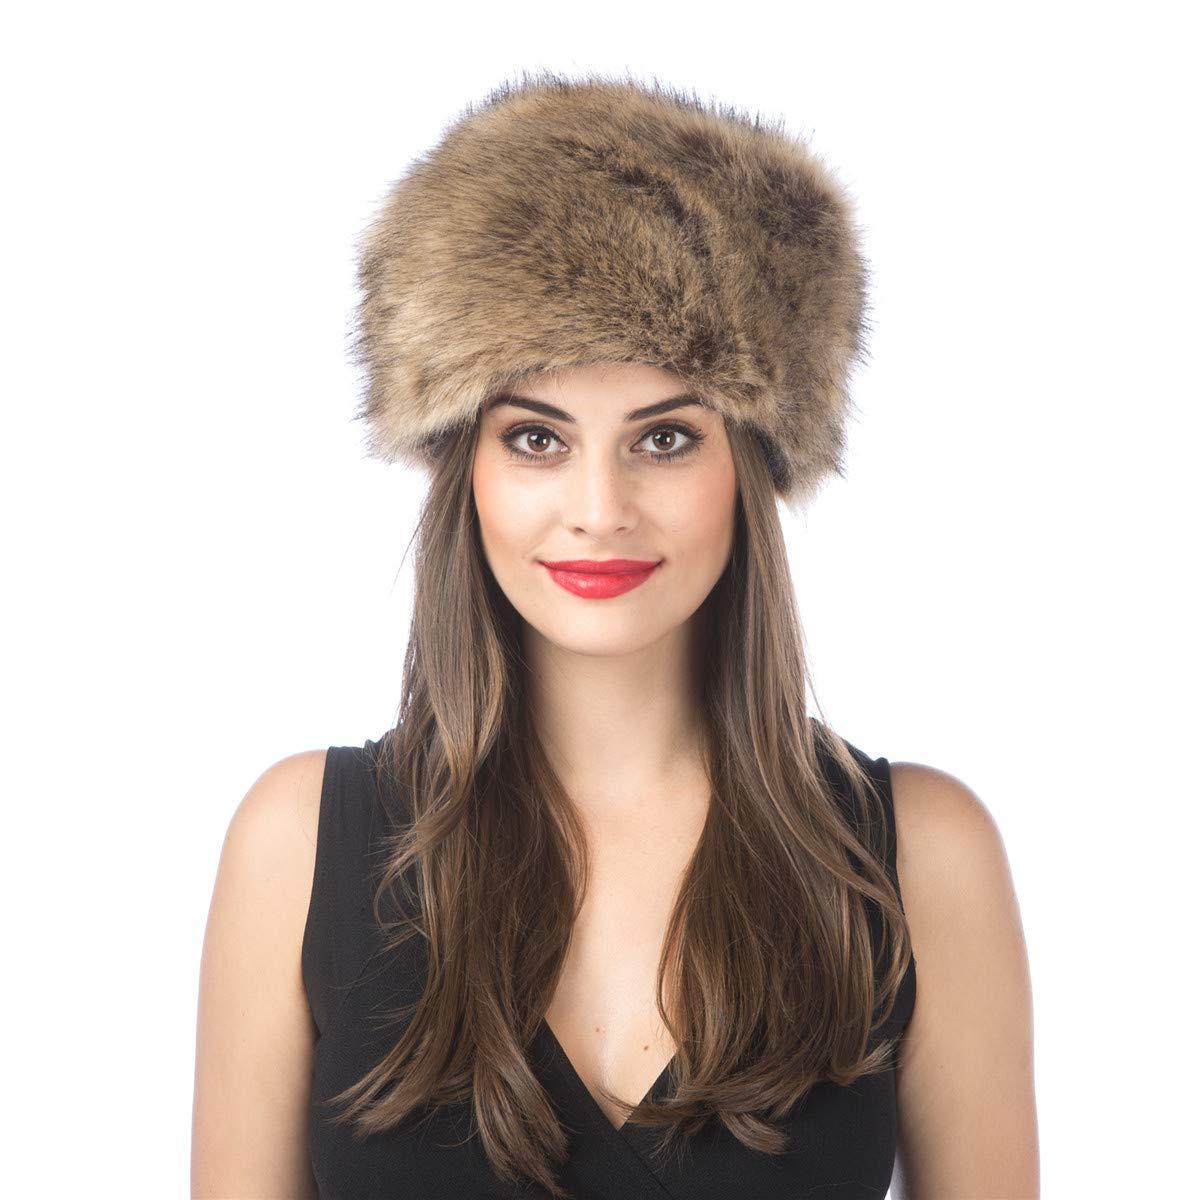 Lucky Leaf Women Men Winter Thick Fur Russian Hat Warm Soft Earmuff (H1-Paille)